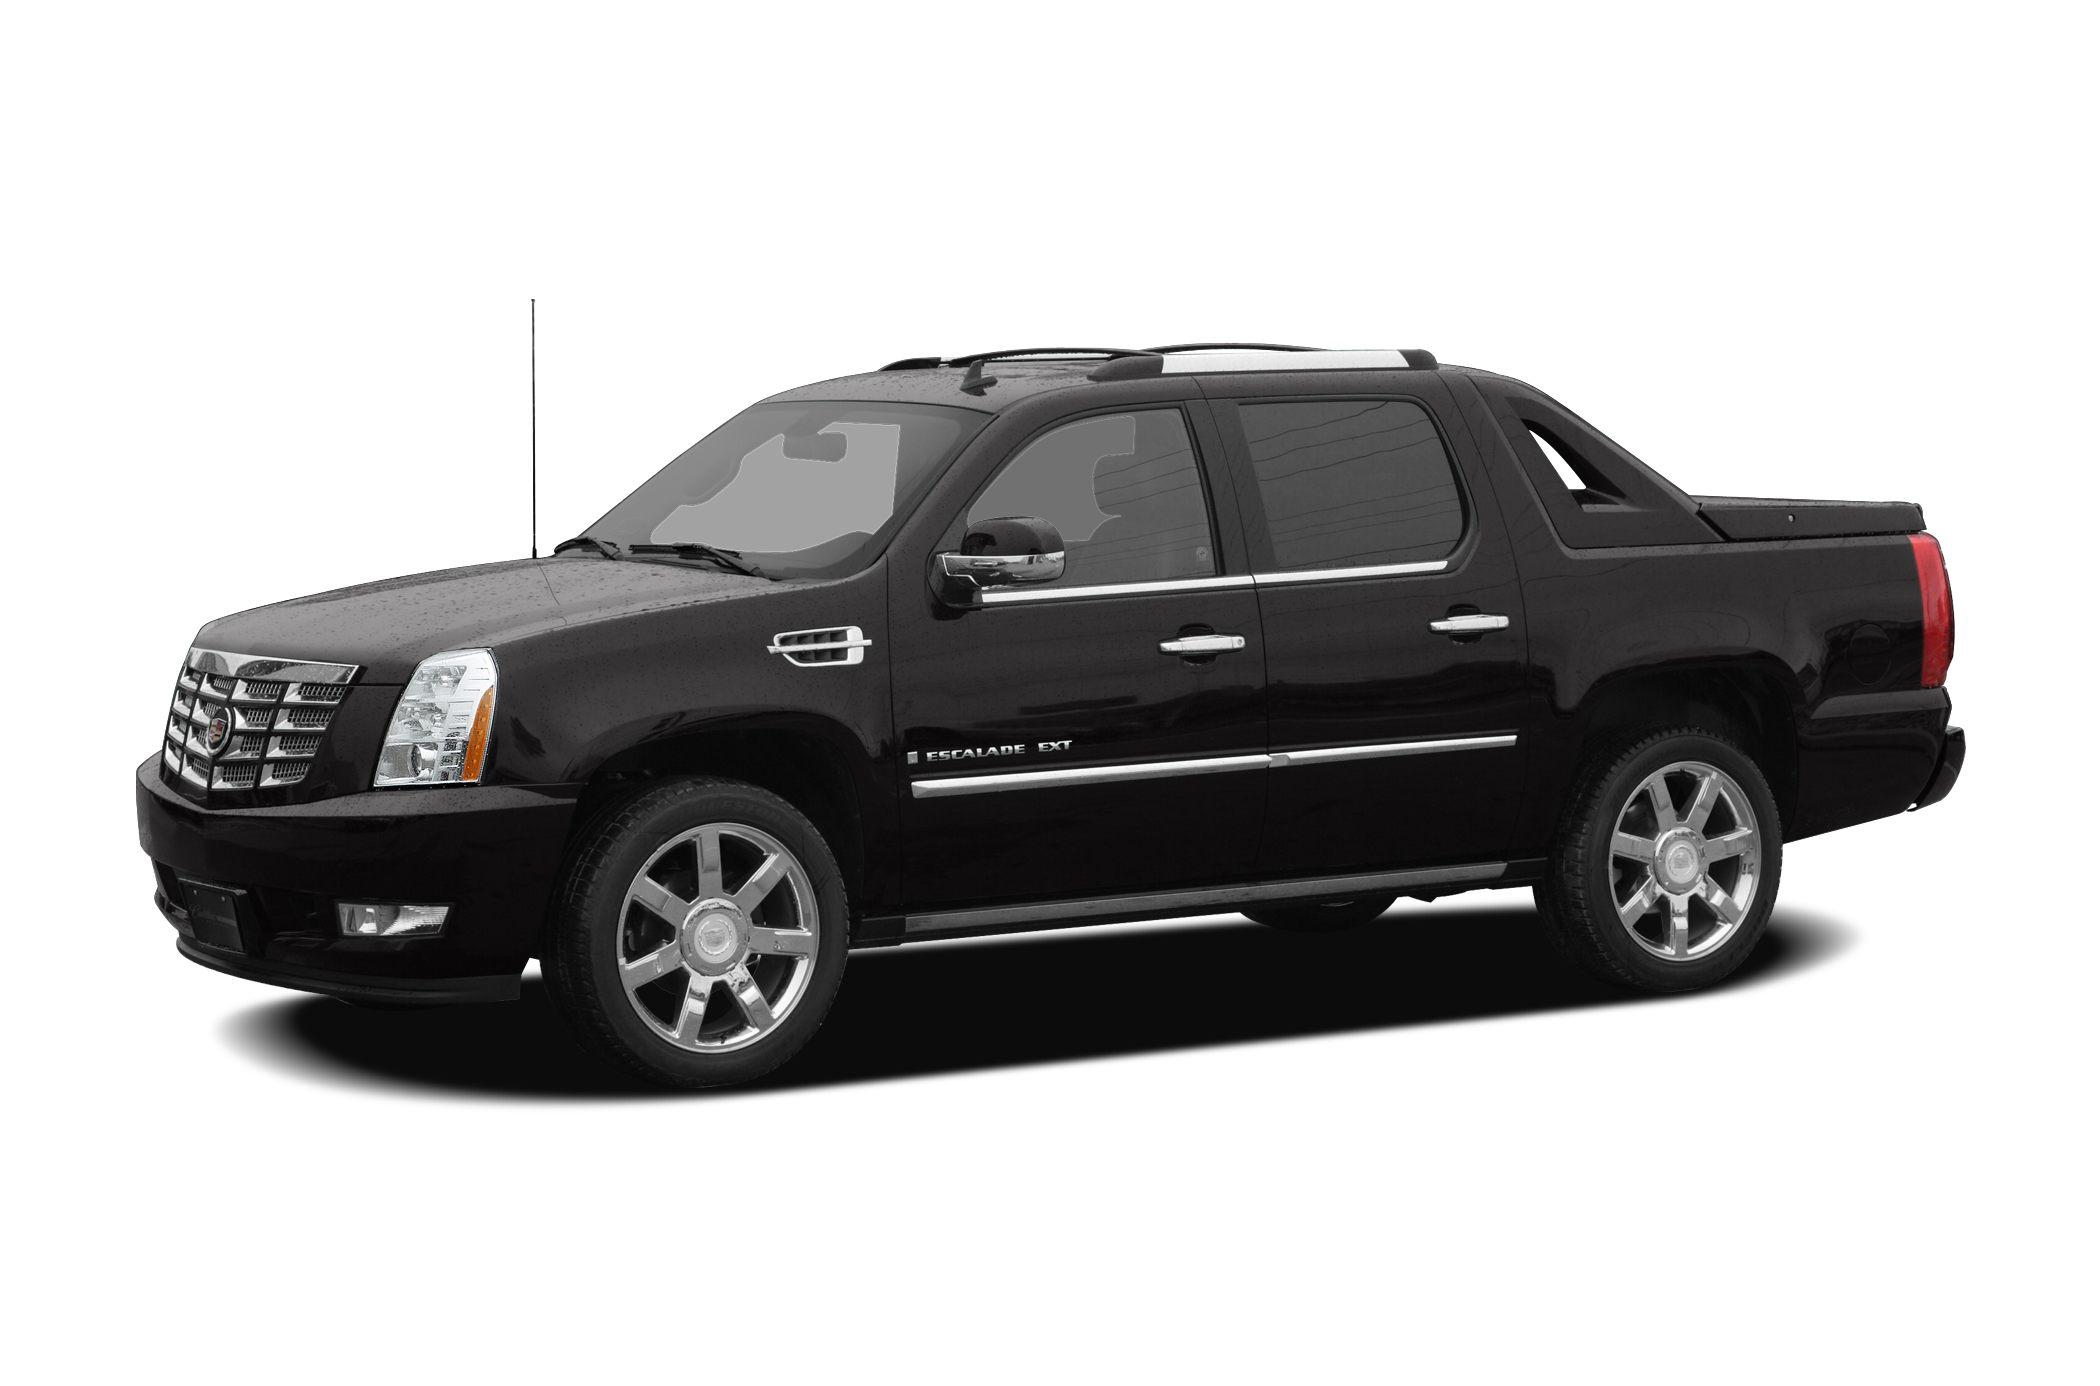 2007 Cadillac Escalade EXT Base Miles 105000Stock STK173463 VIN 3GYFK62807G173463